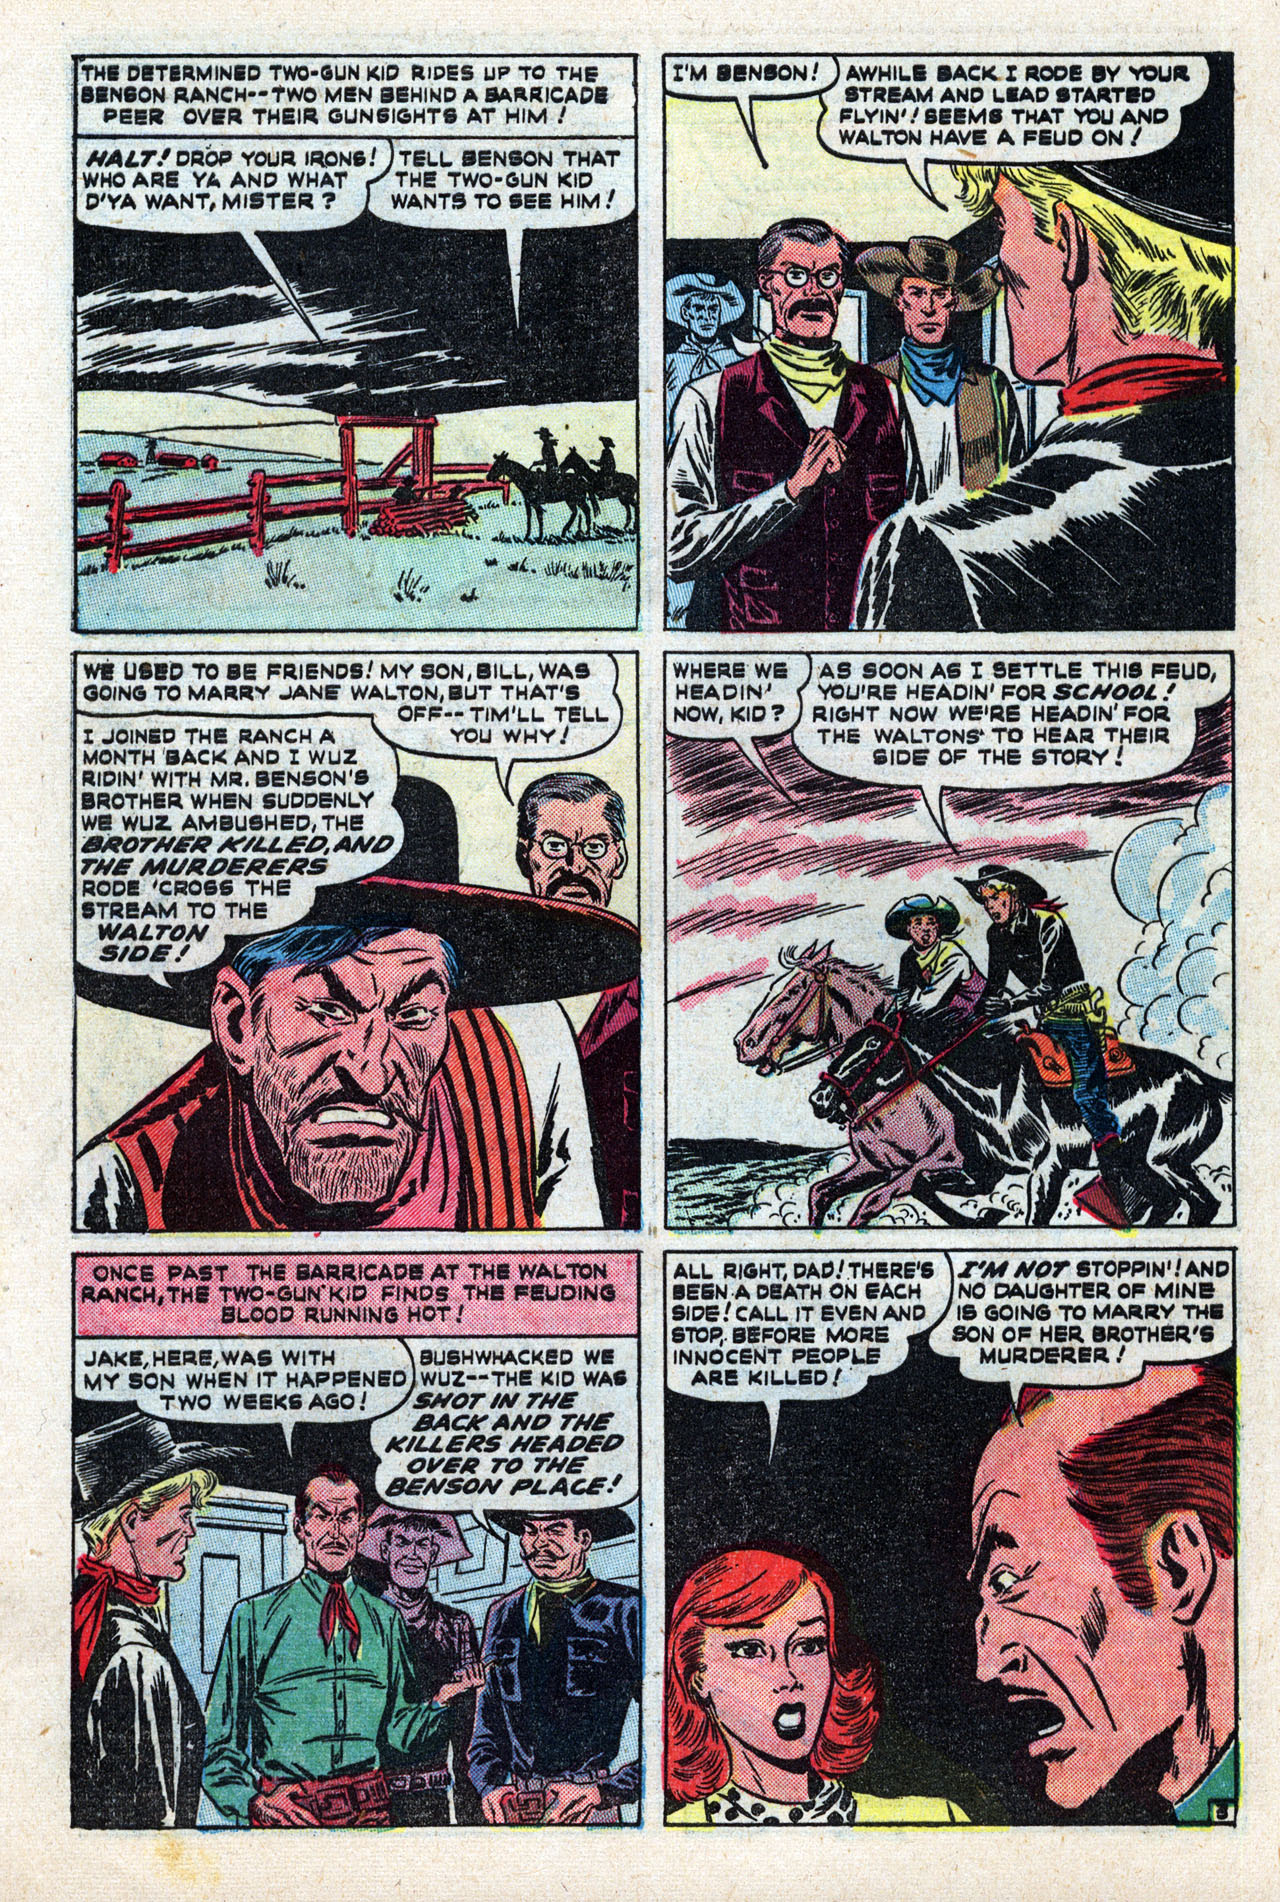 Read online Two-Gun Kid comic -  Issue #10 - 42